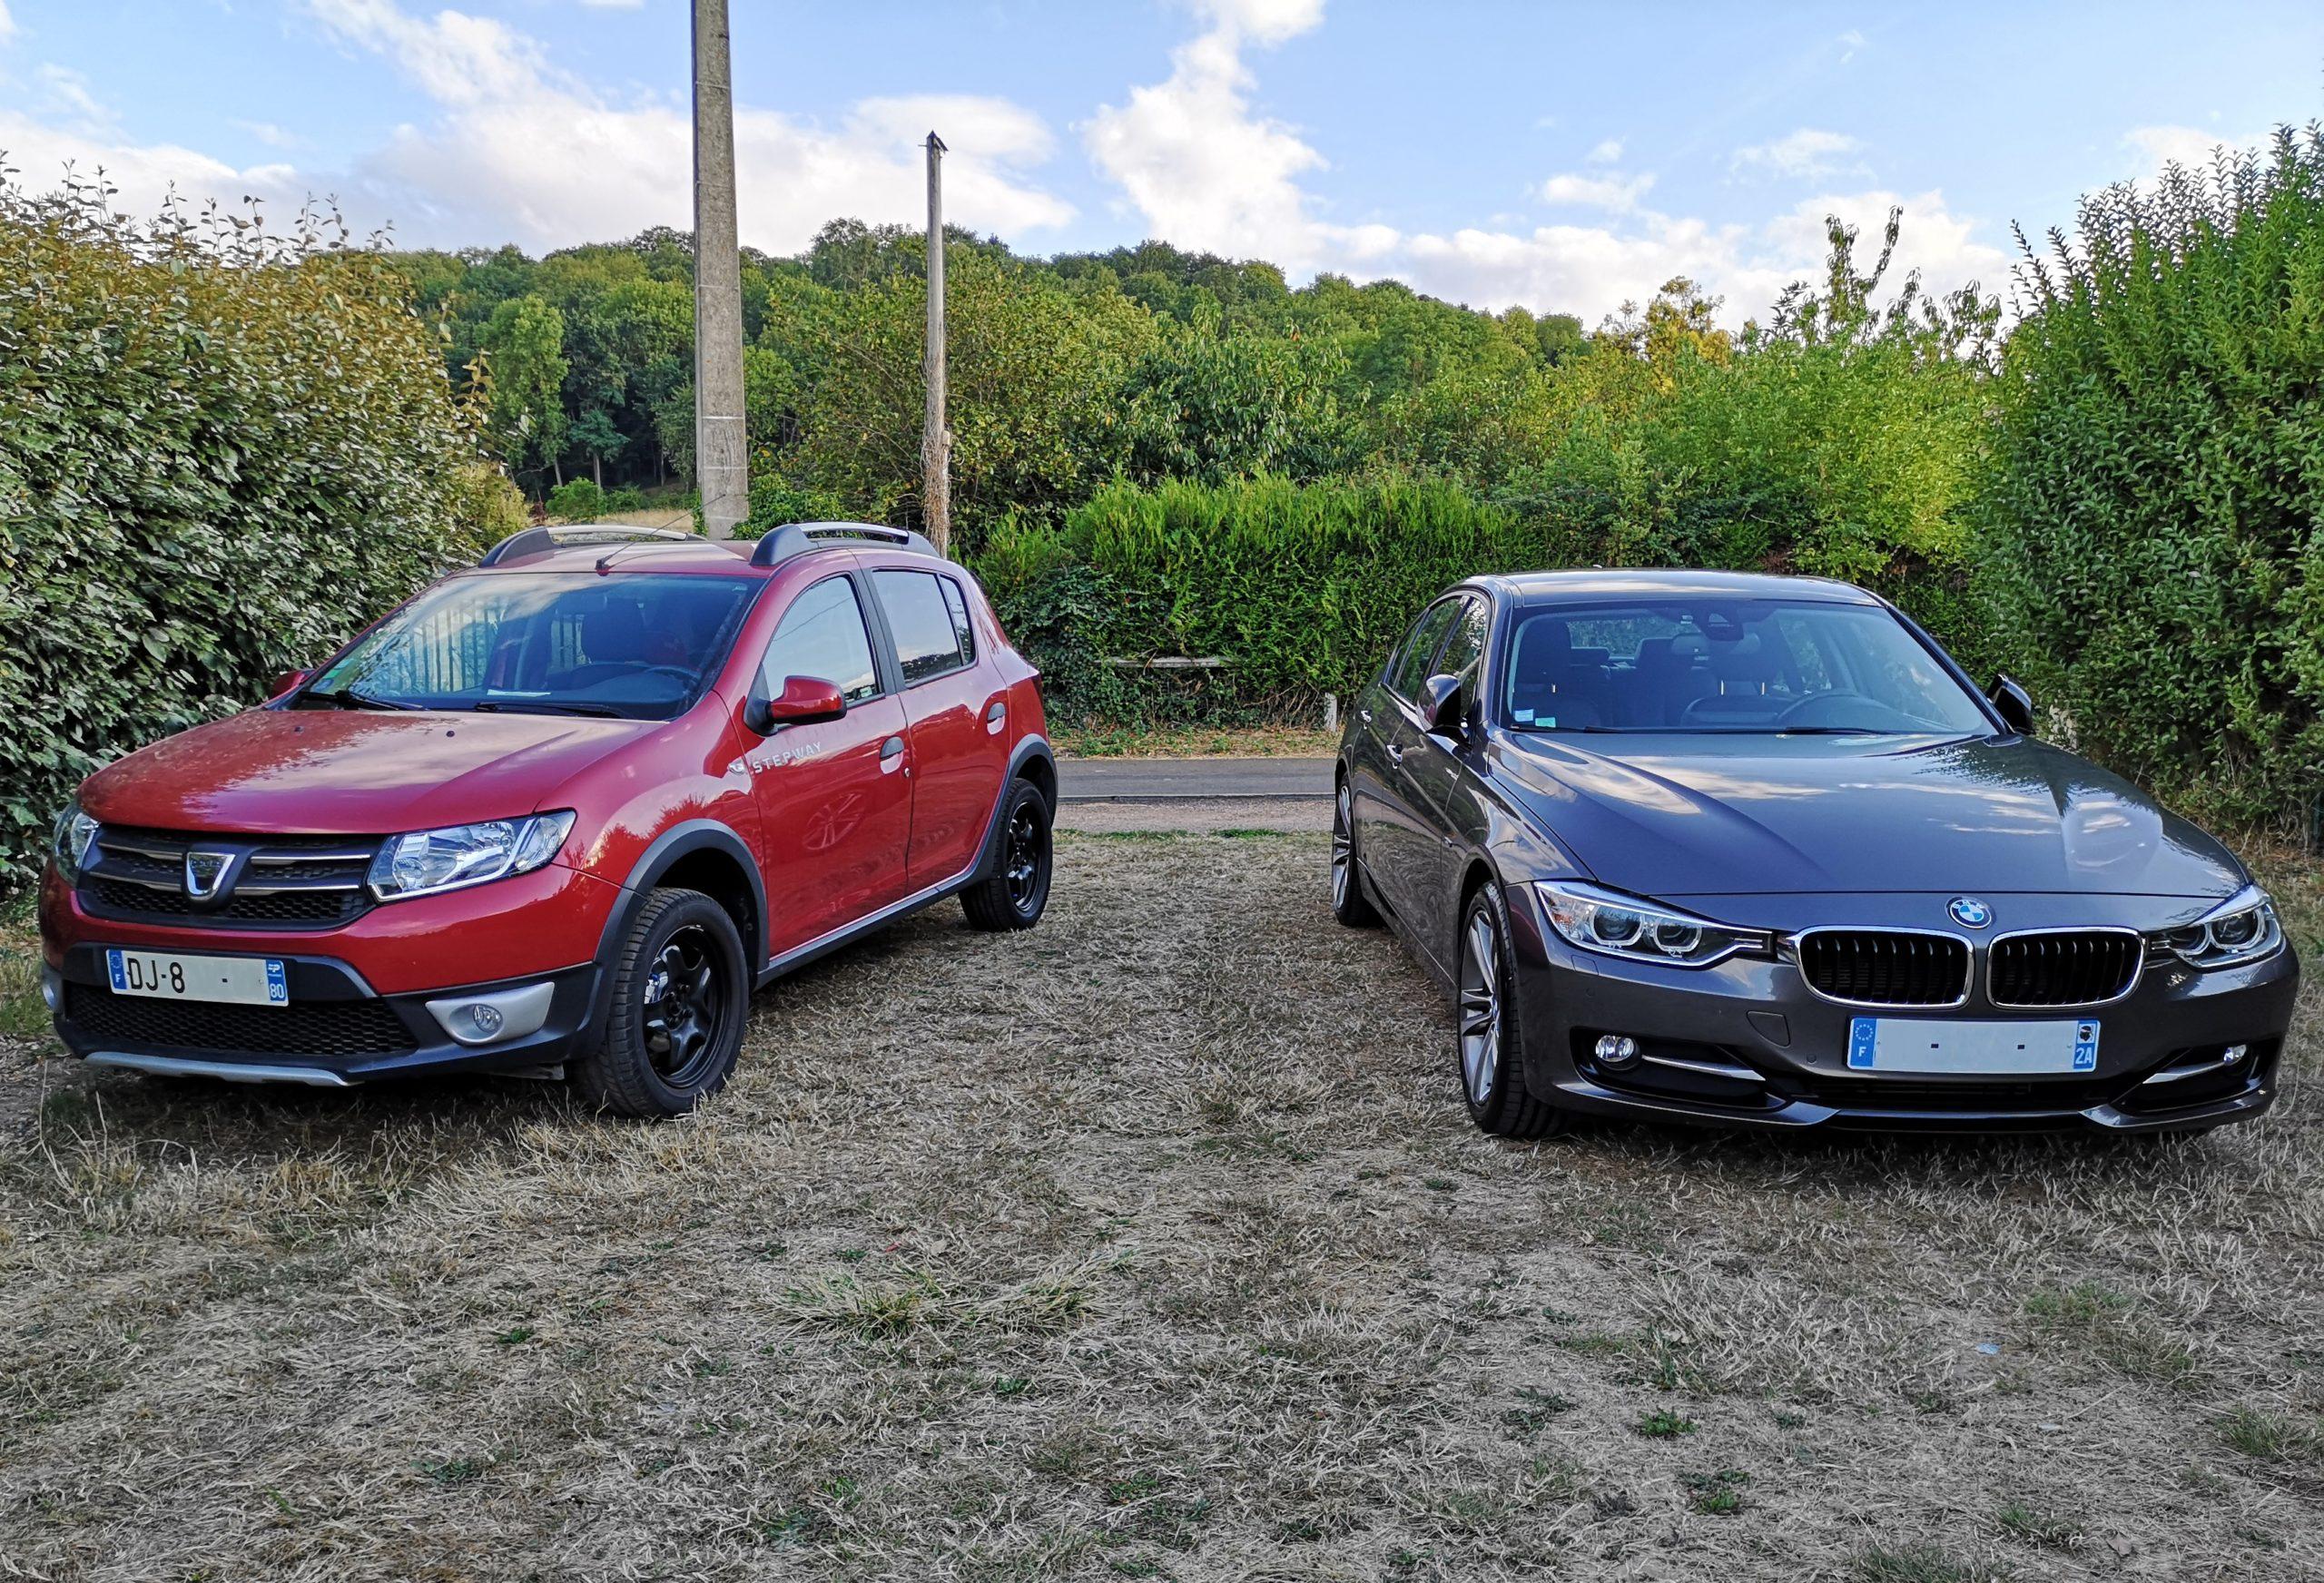 BMW-Série-3-F30-DPF-16V-184cv-Dacia-Sandero-2